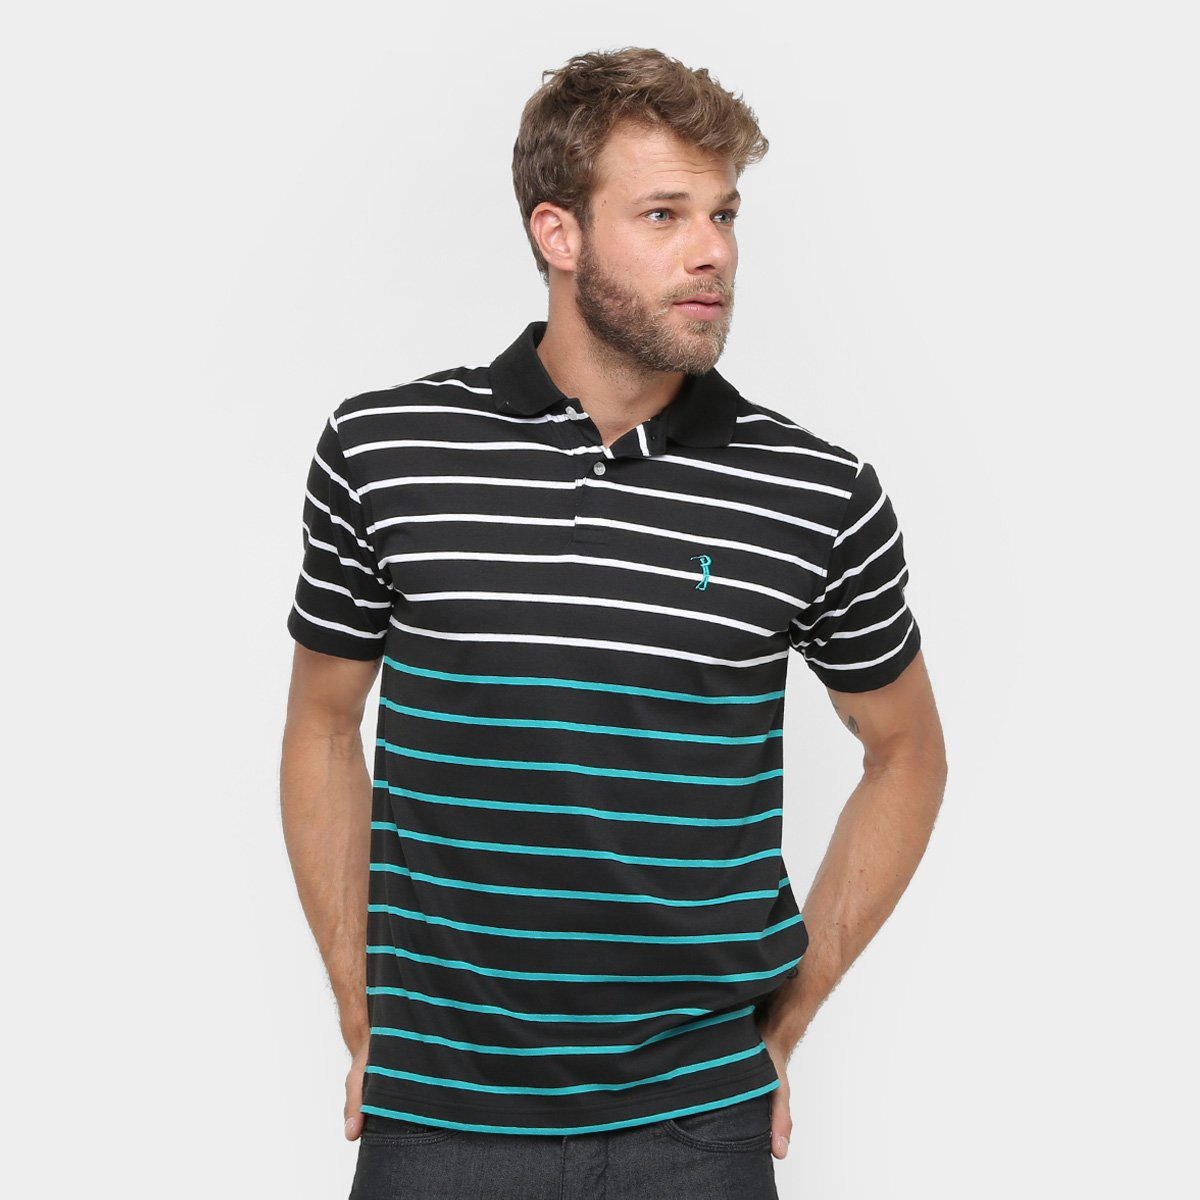 Camisa Polo Aleatory Malha Fio Tinto Listras Masculina - Compre ... 632c6a7129d67